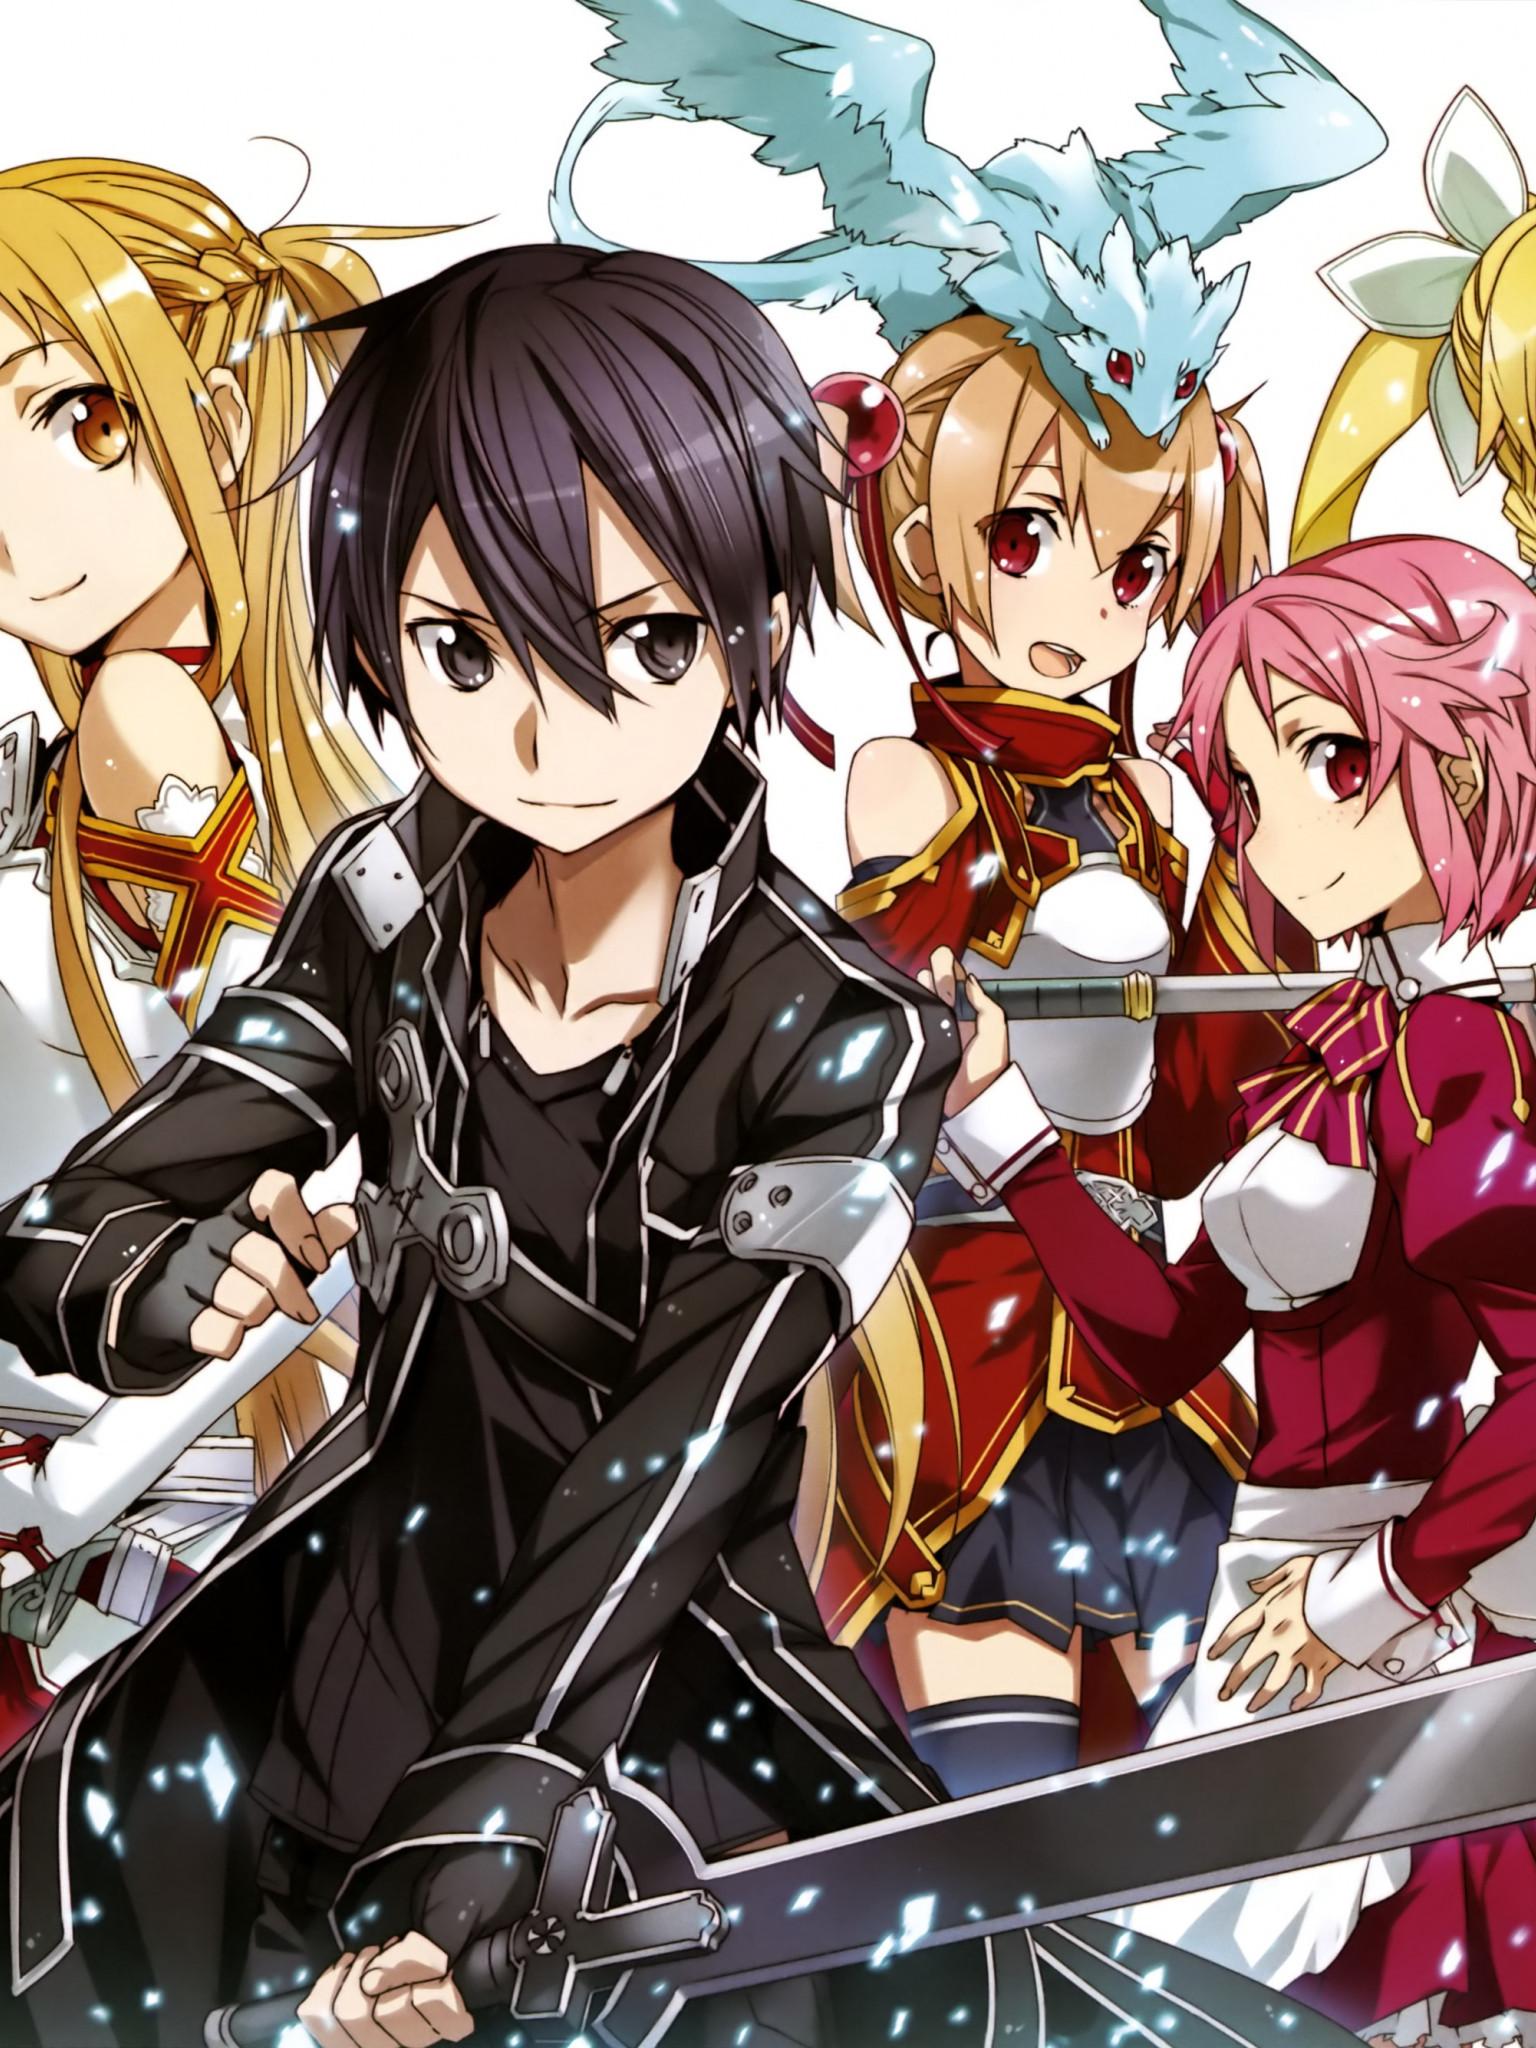 HD Wallpaper Sword Art Online 2 Asuna Kirito Sinon